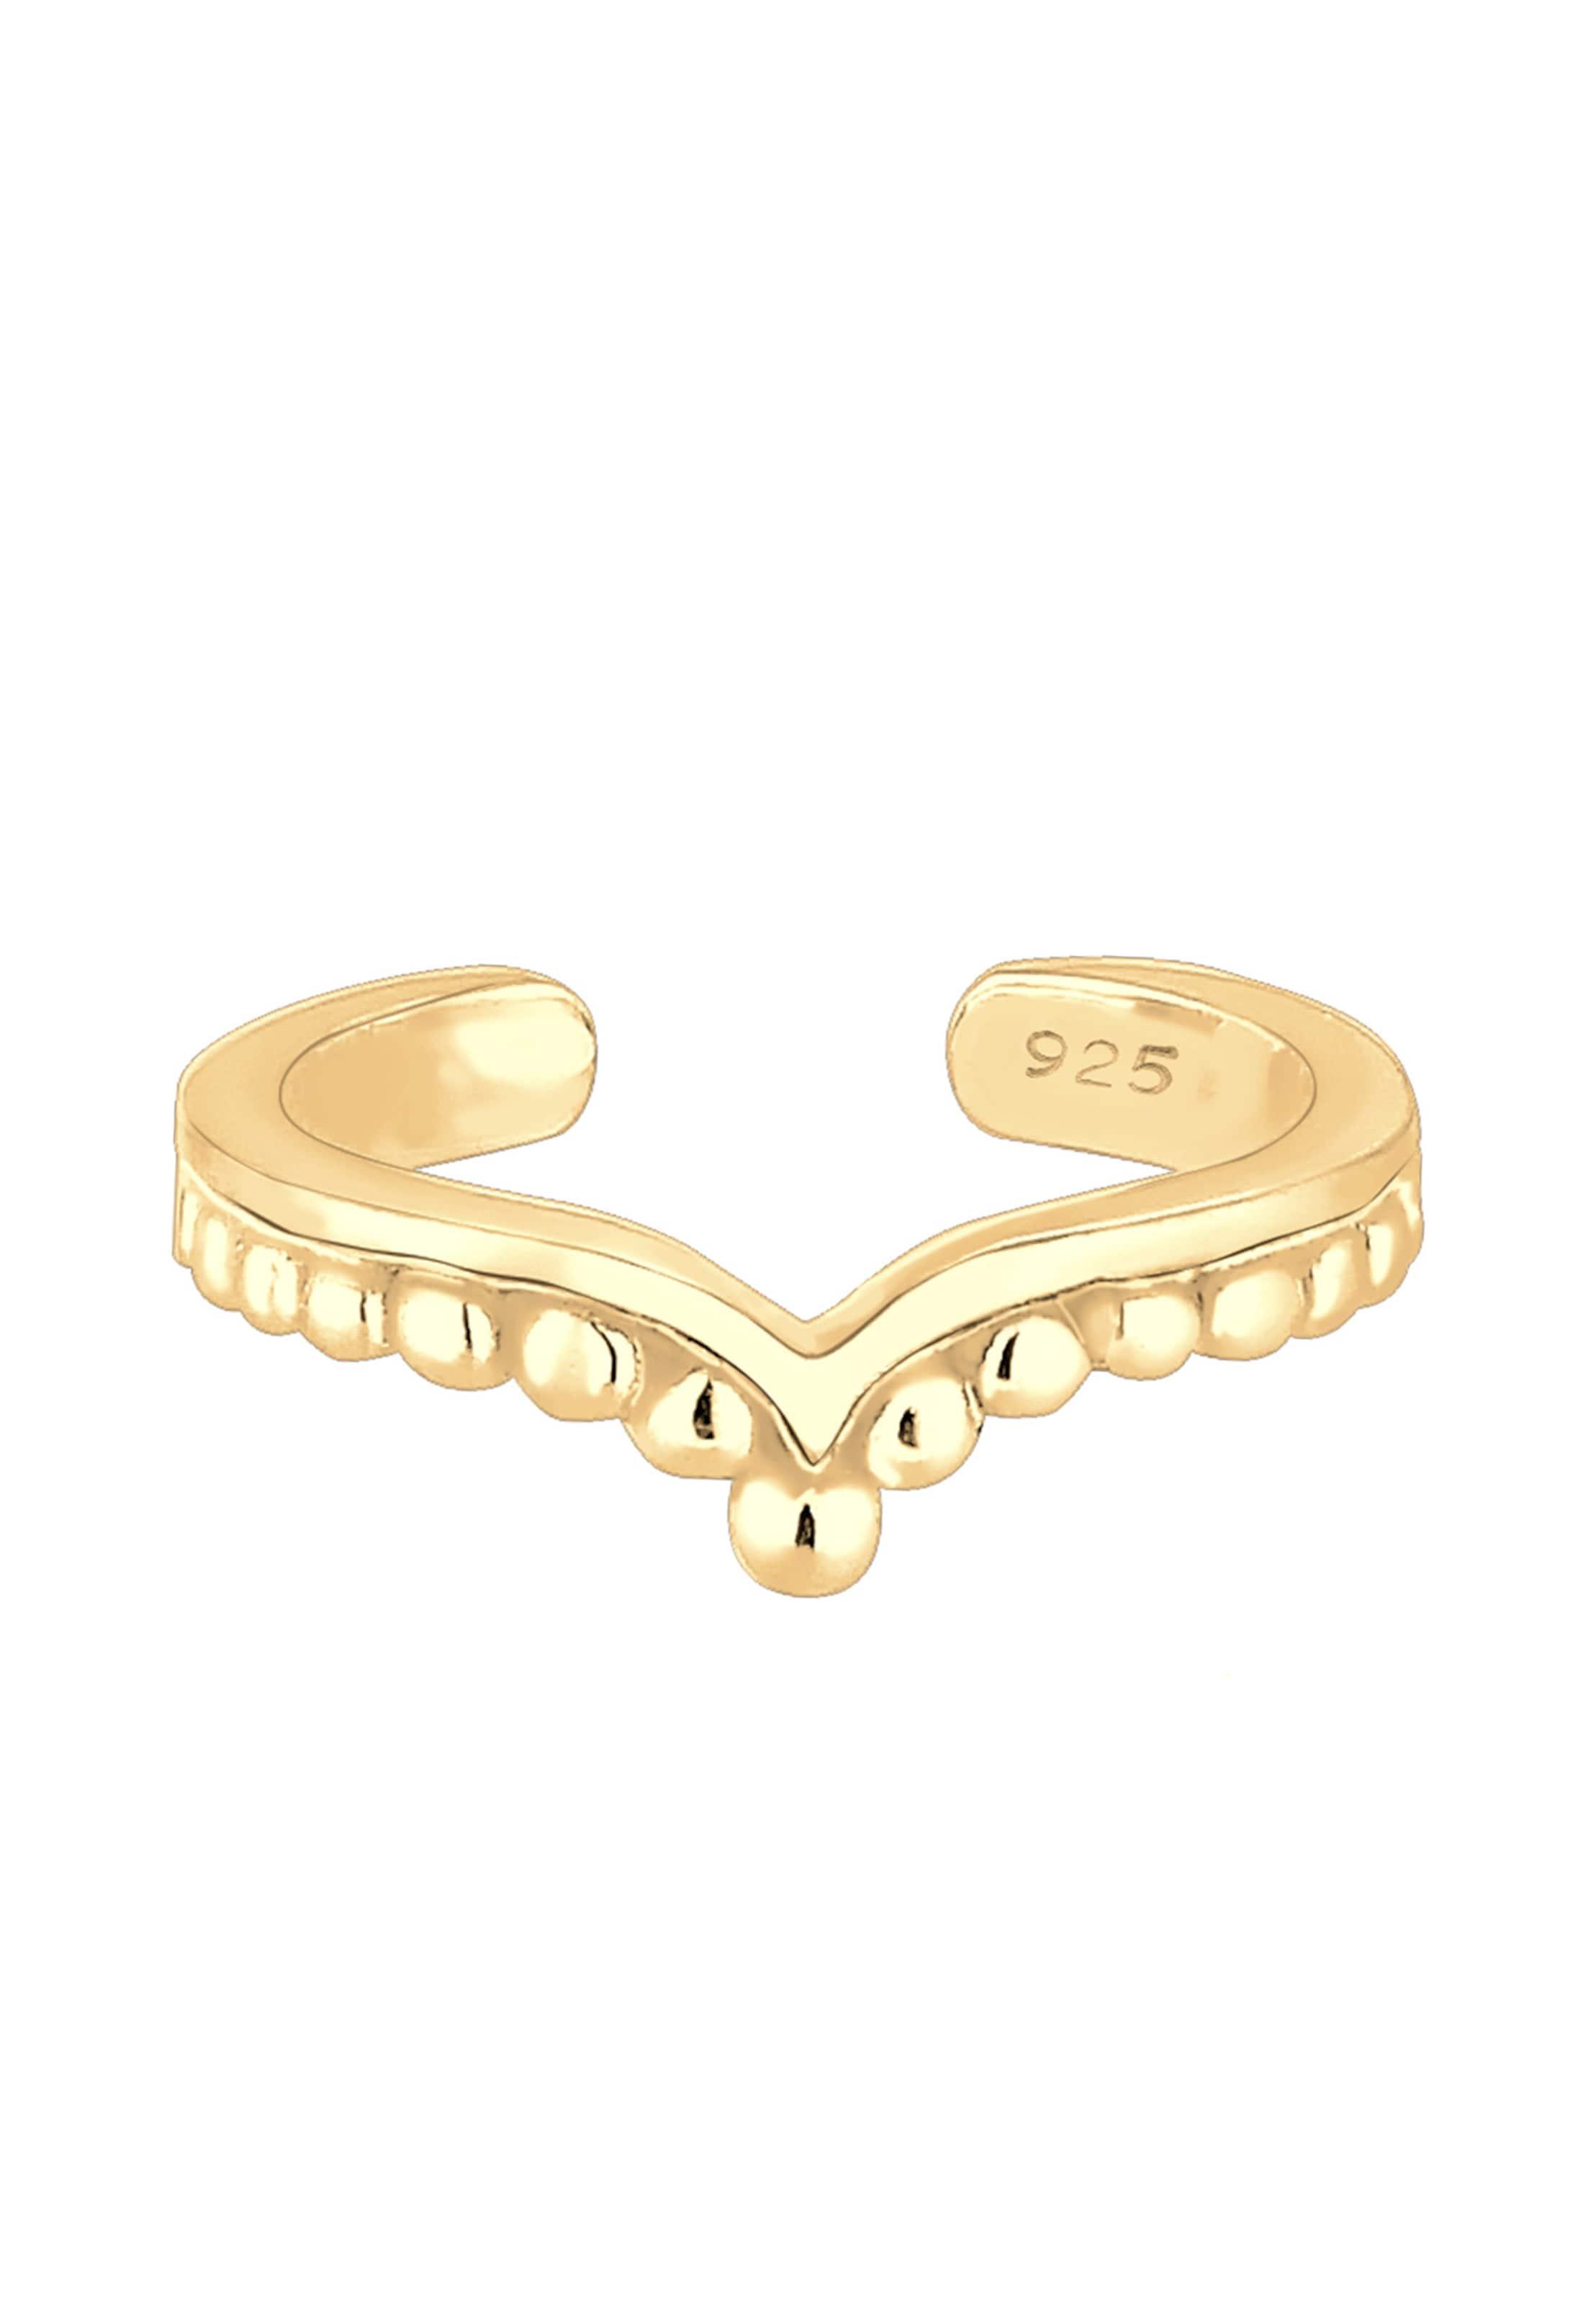 Ring 'boho' In 'boho' Gold In Elli Elli Ring Gold hrtQxdsC